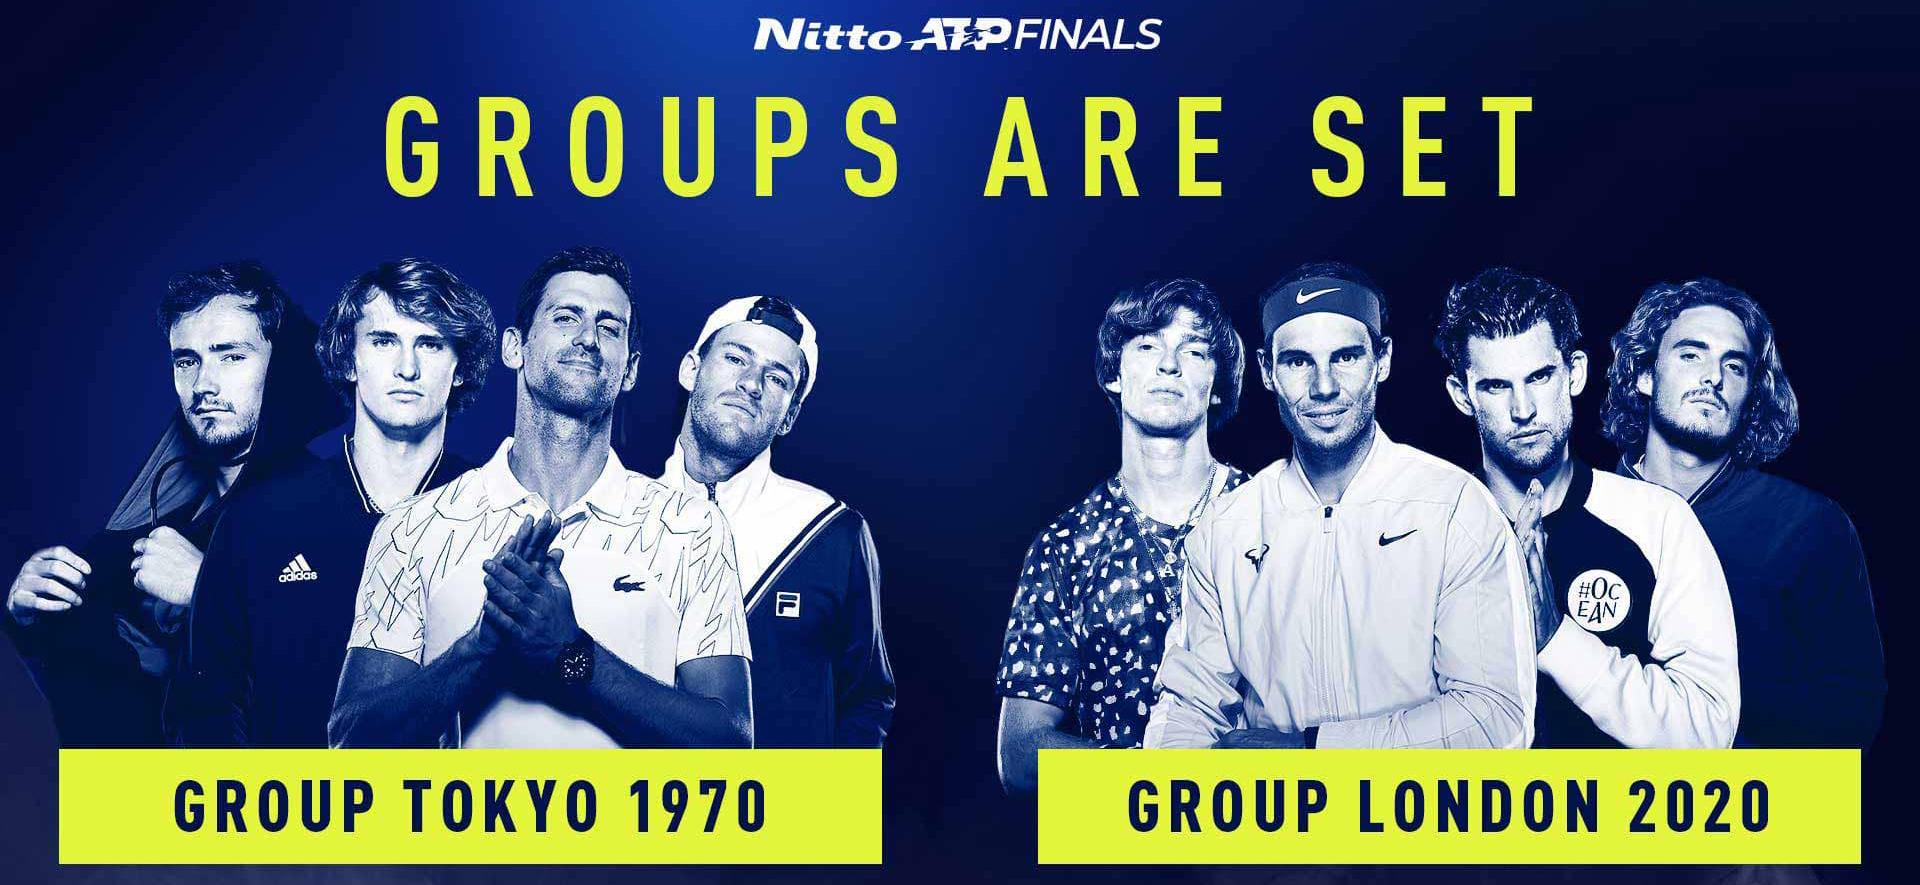 Nitto ATP Finals Grupos